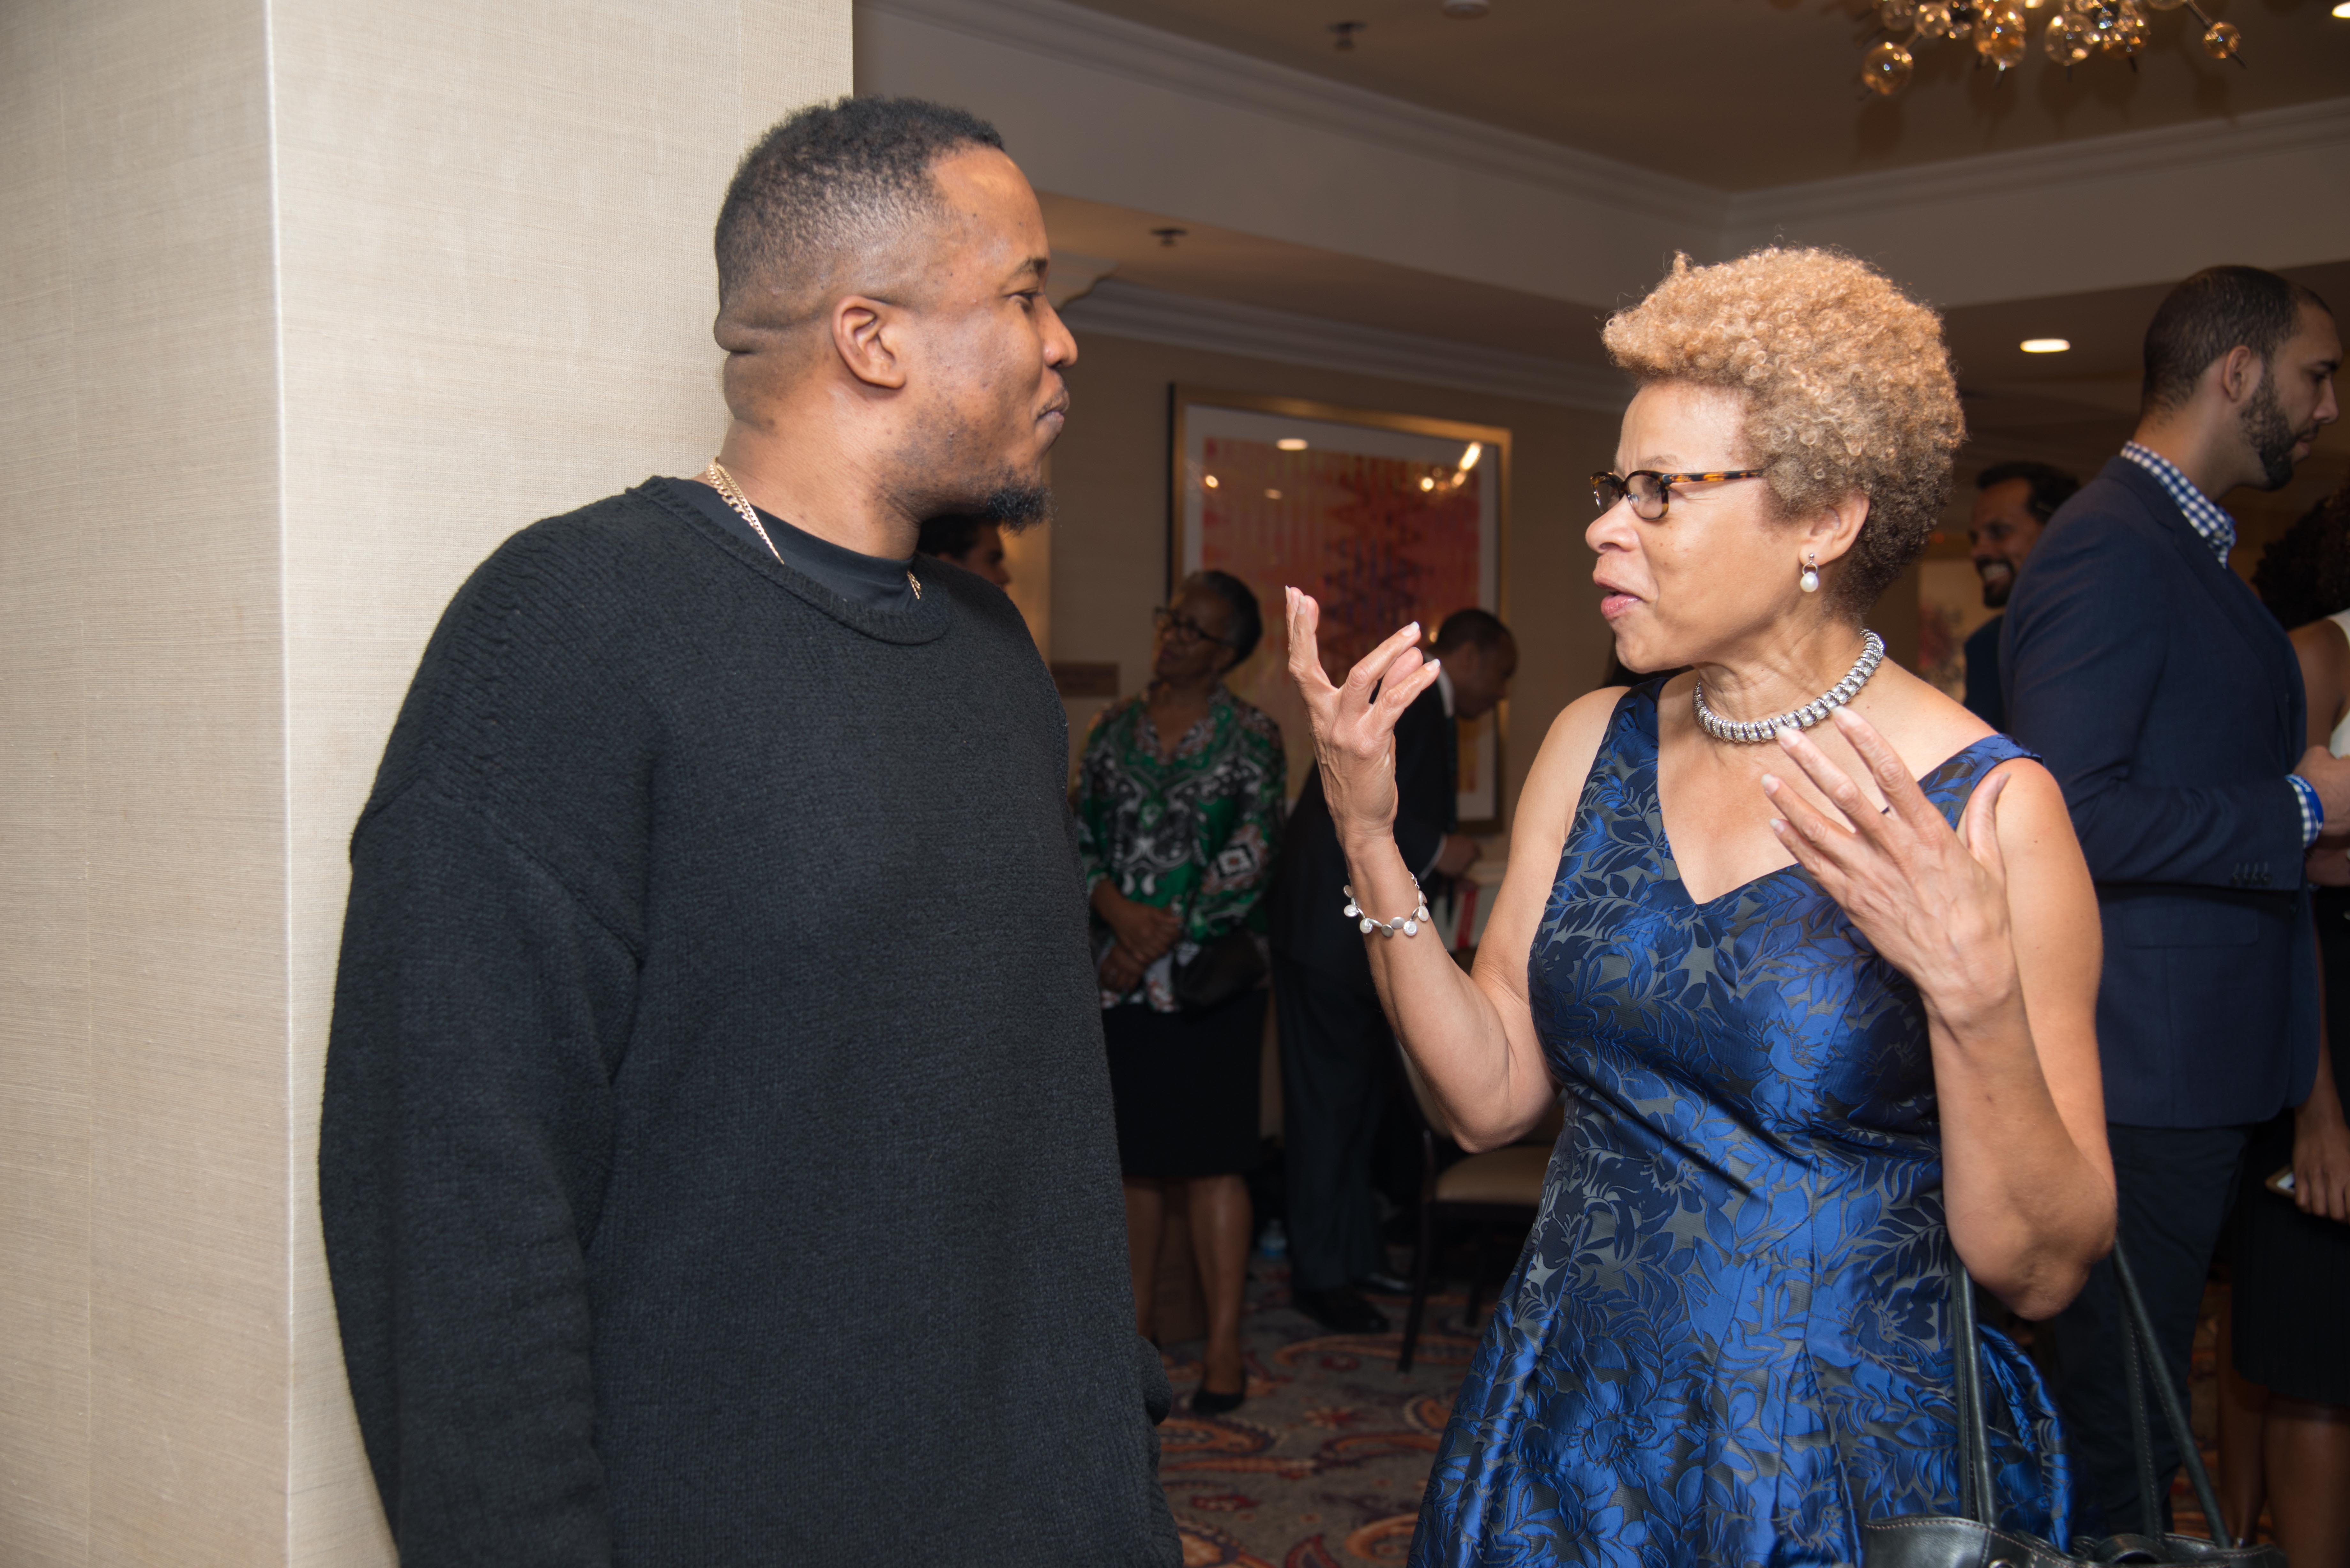 D. Watkins and Deborah Heard